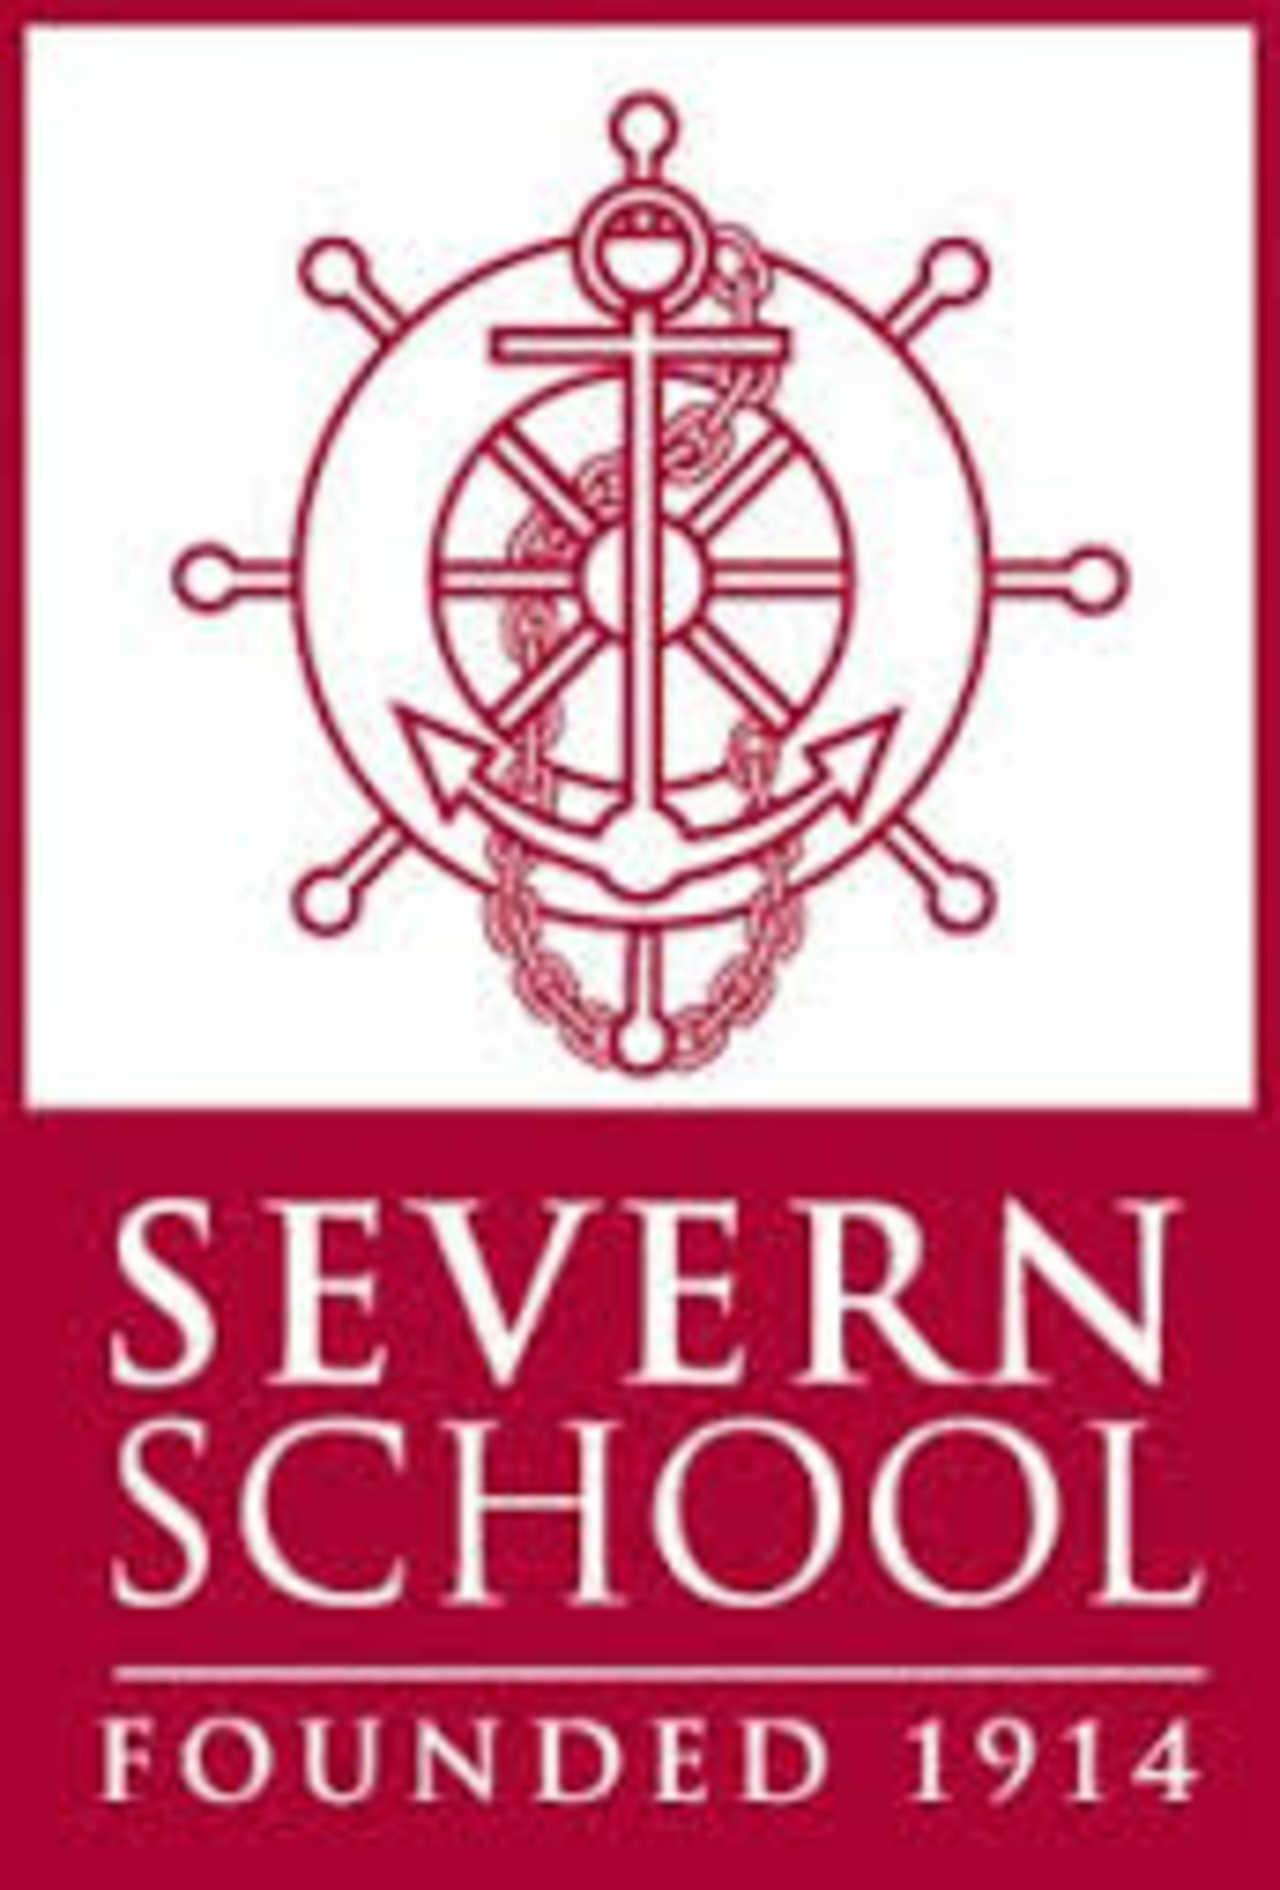 Severn School - Education - Private Schools in Severna Park MD